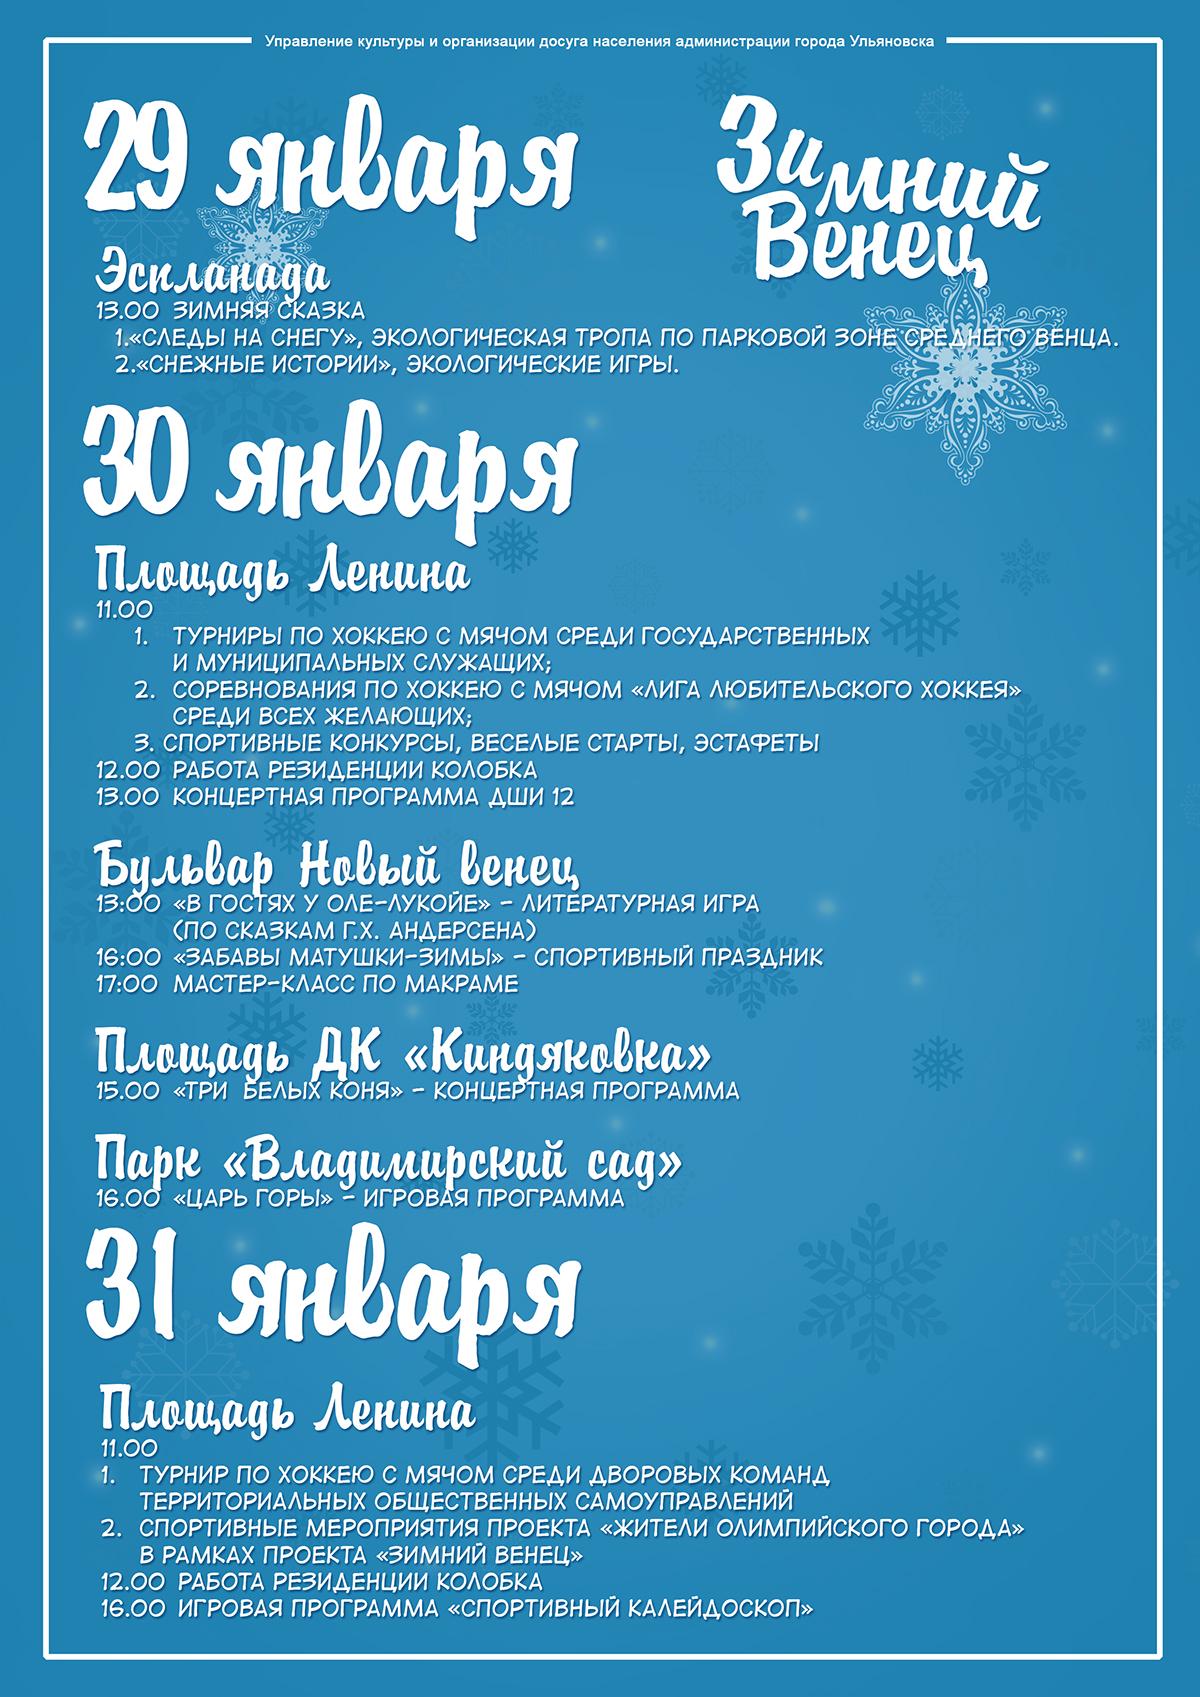 Zimniy-Venets